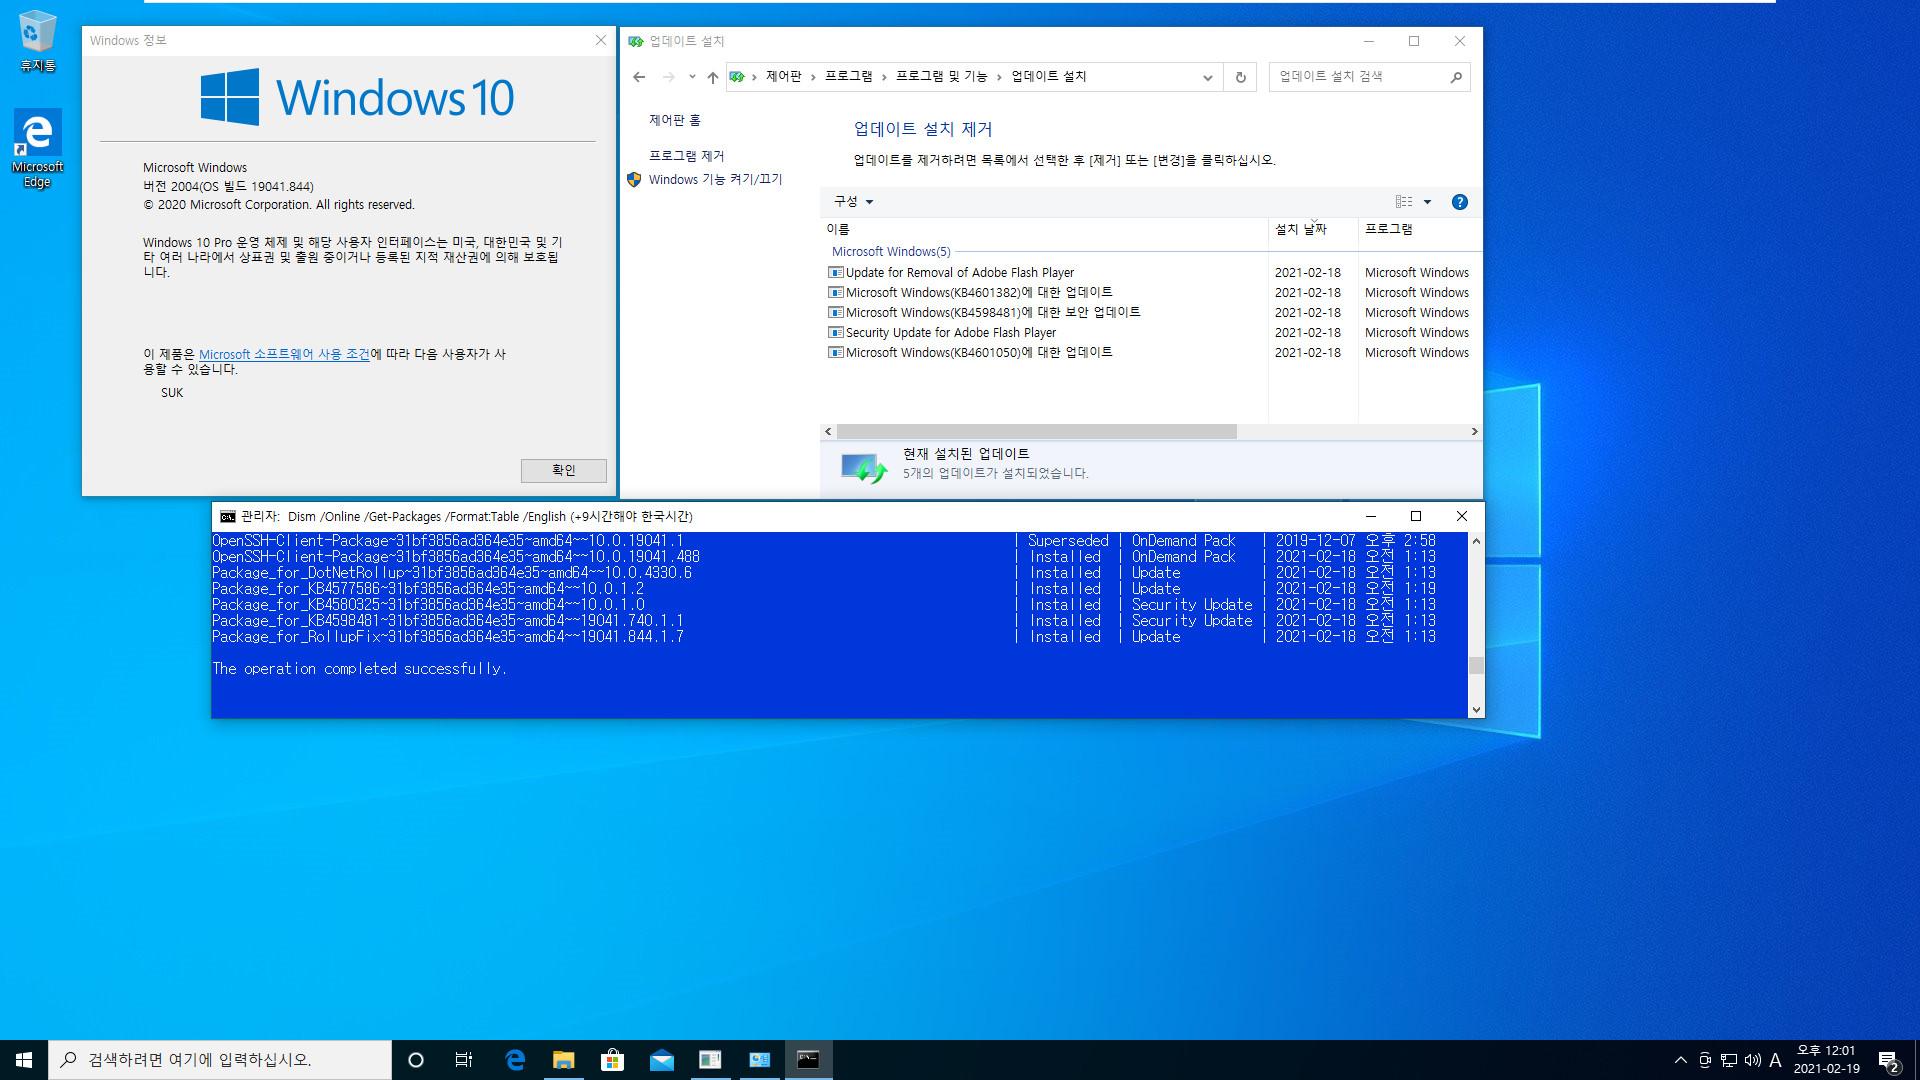 Windows 10 버전 21H1, 19043 빌드로 업그레이드 테스트 - 버전 20H2만 아니라, 버전 2004 에서도 KB5000736 제거하면 원래 버전으로 돌아갑니다 2021-02-19_120144.jpg